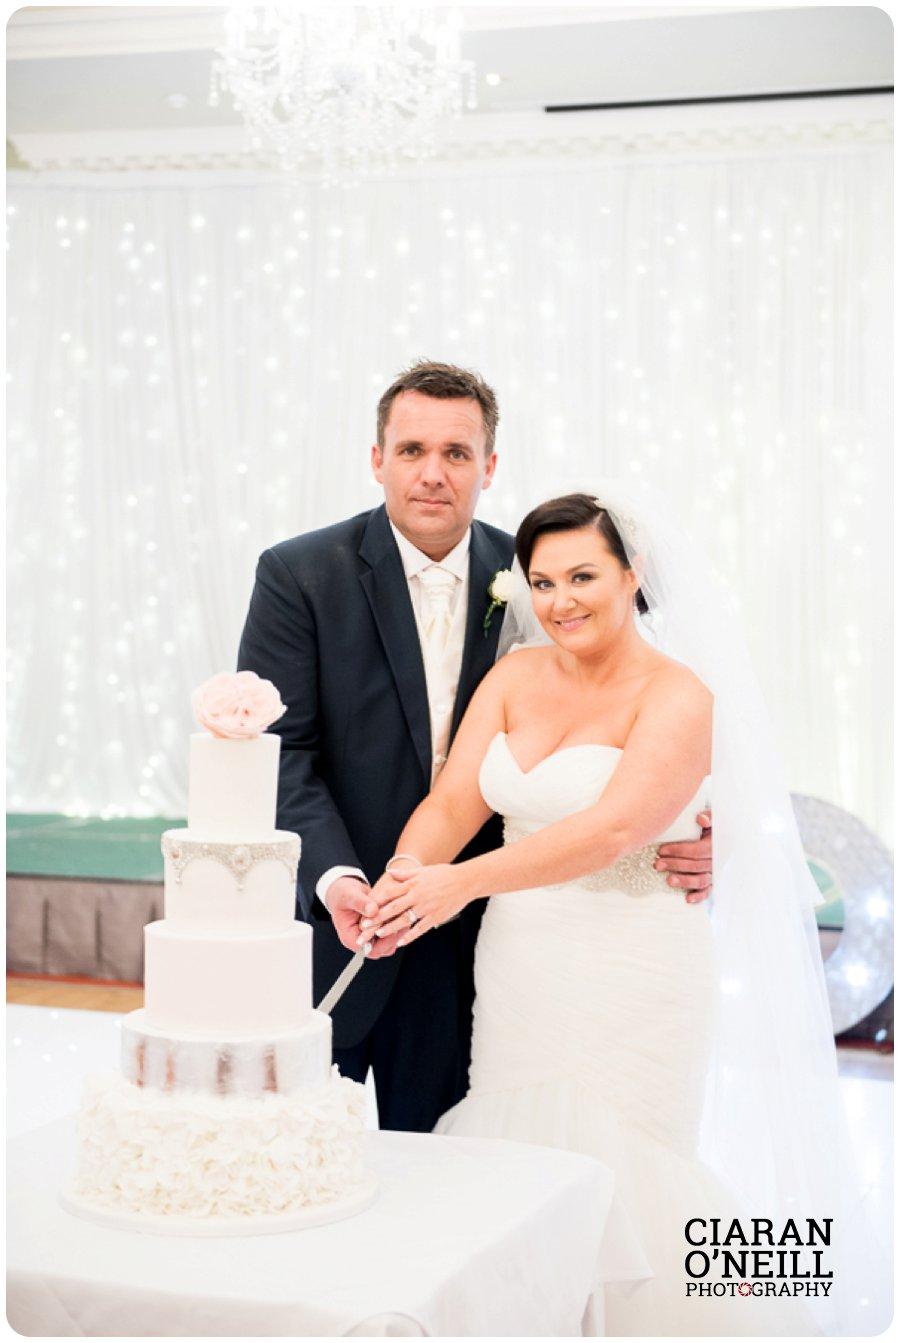 Lorna & David's wedding at the Manor House Hotel by Ciaran O'Neill Photography 22